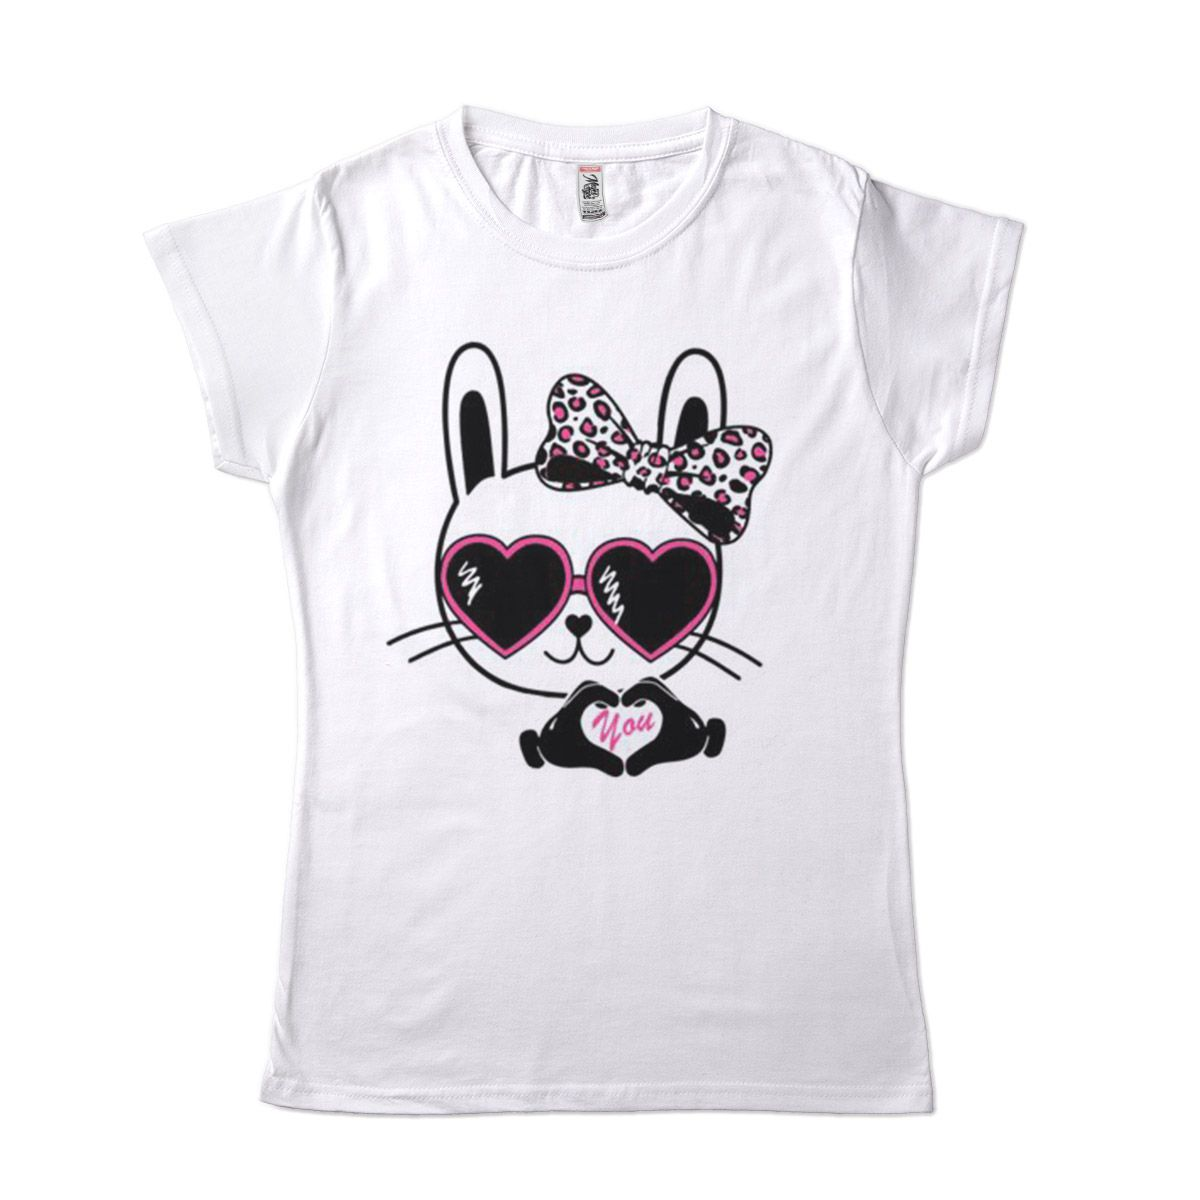 camiseta gato de oculos feminina coracao